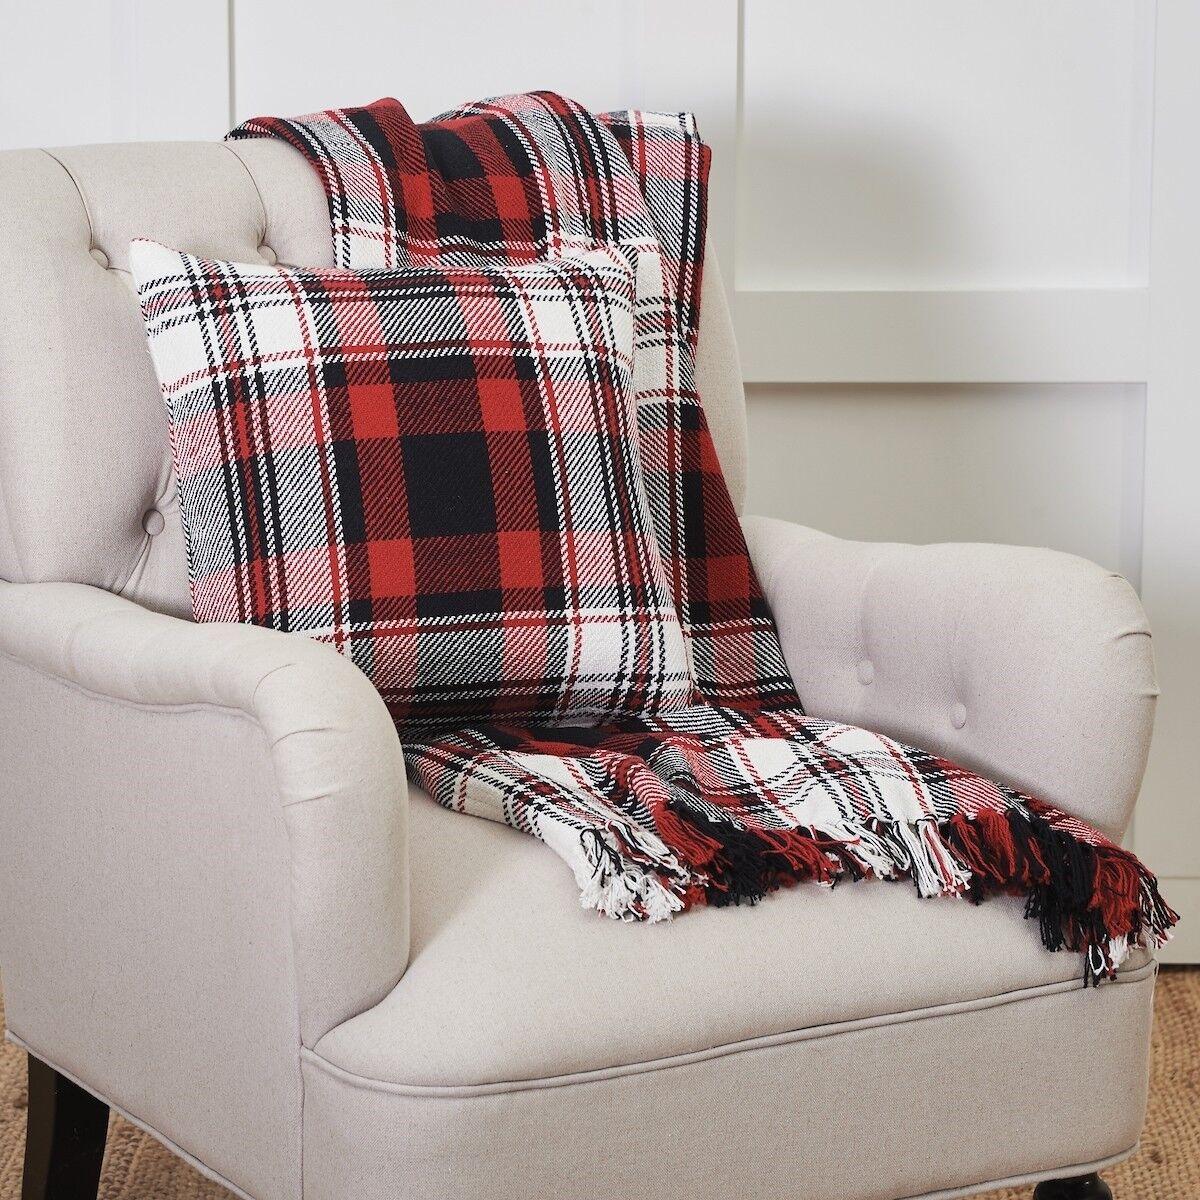 Fireside Woven Cotton Plaid Throw or Plaid Toss Pillow-Matches Fireside Blanket